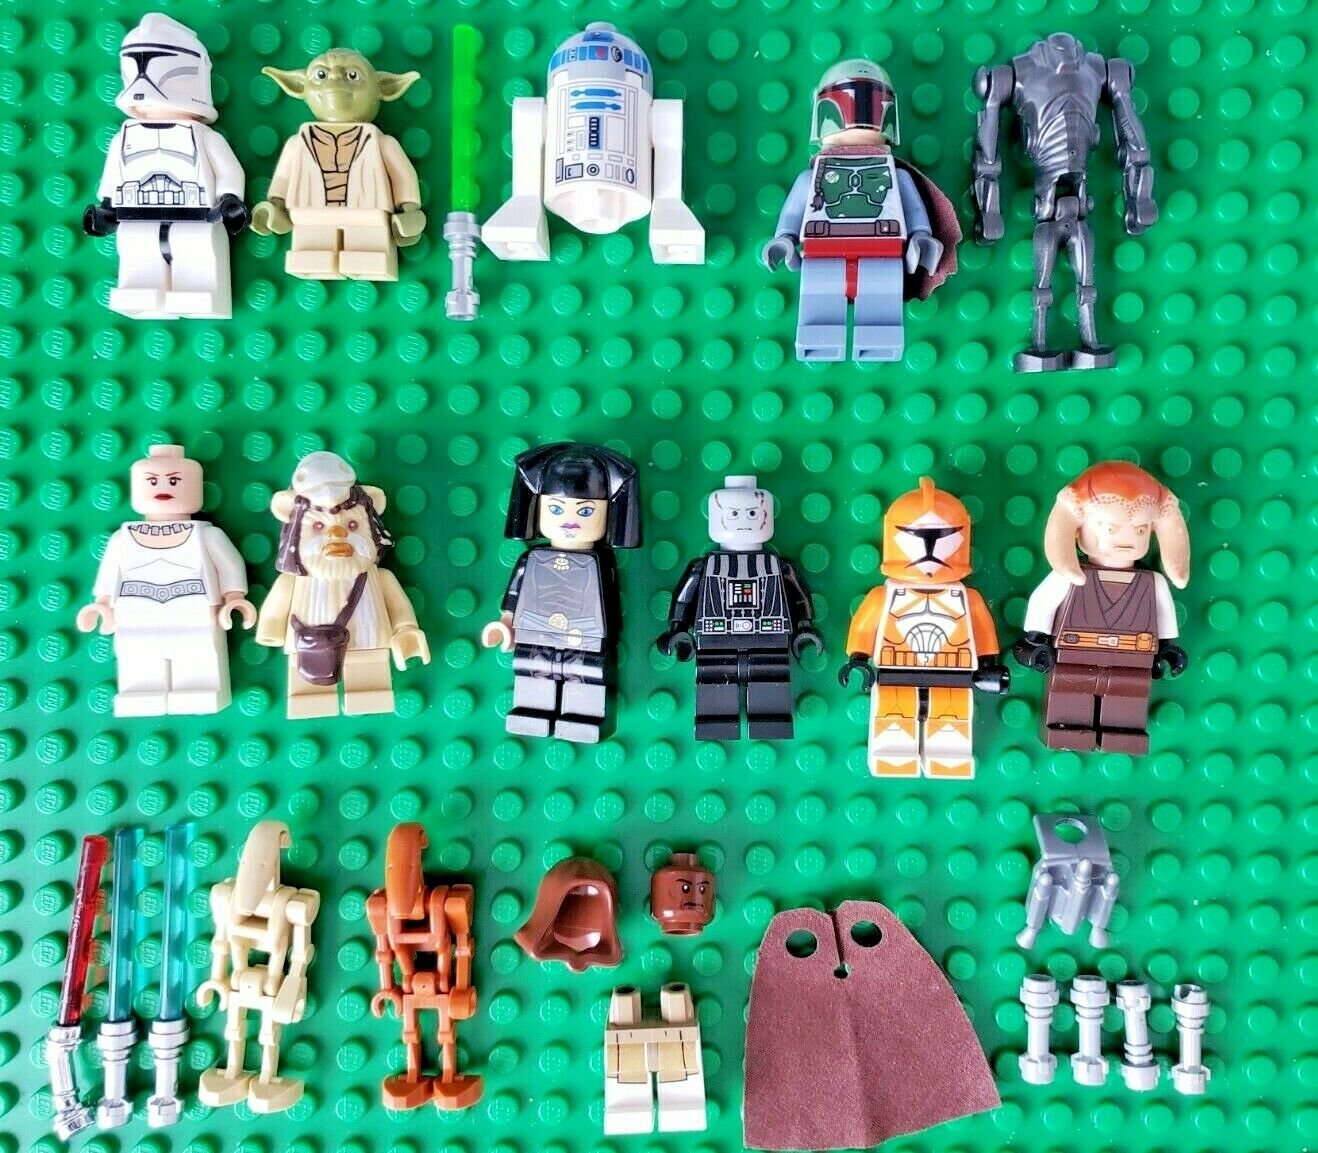 Lego Star Wars Minifigure Lot Boba Fett Leia Clone Trooper Droid Vader Yoda Mace